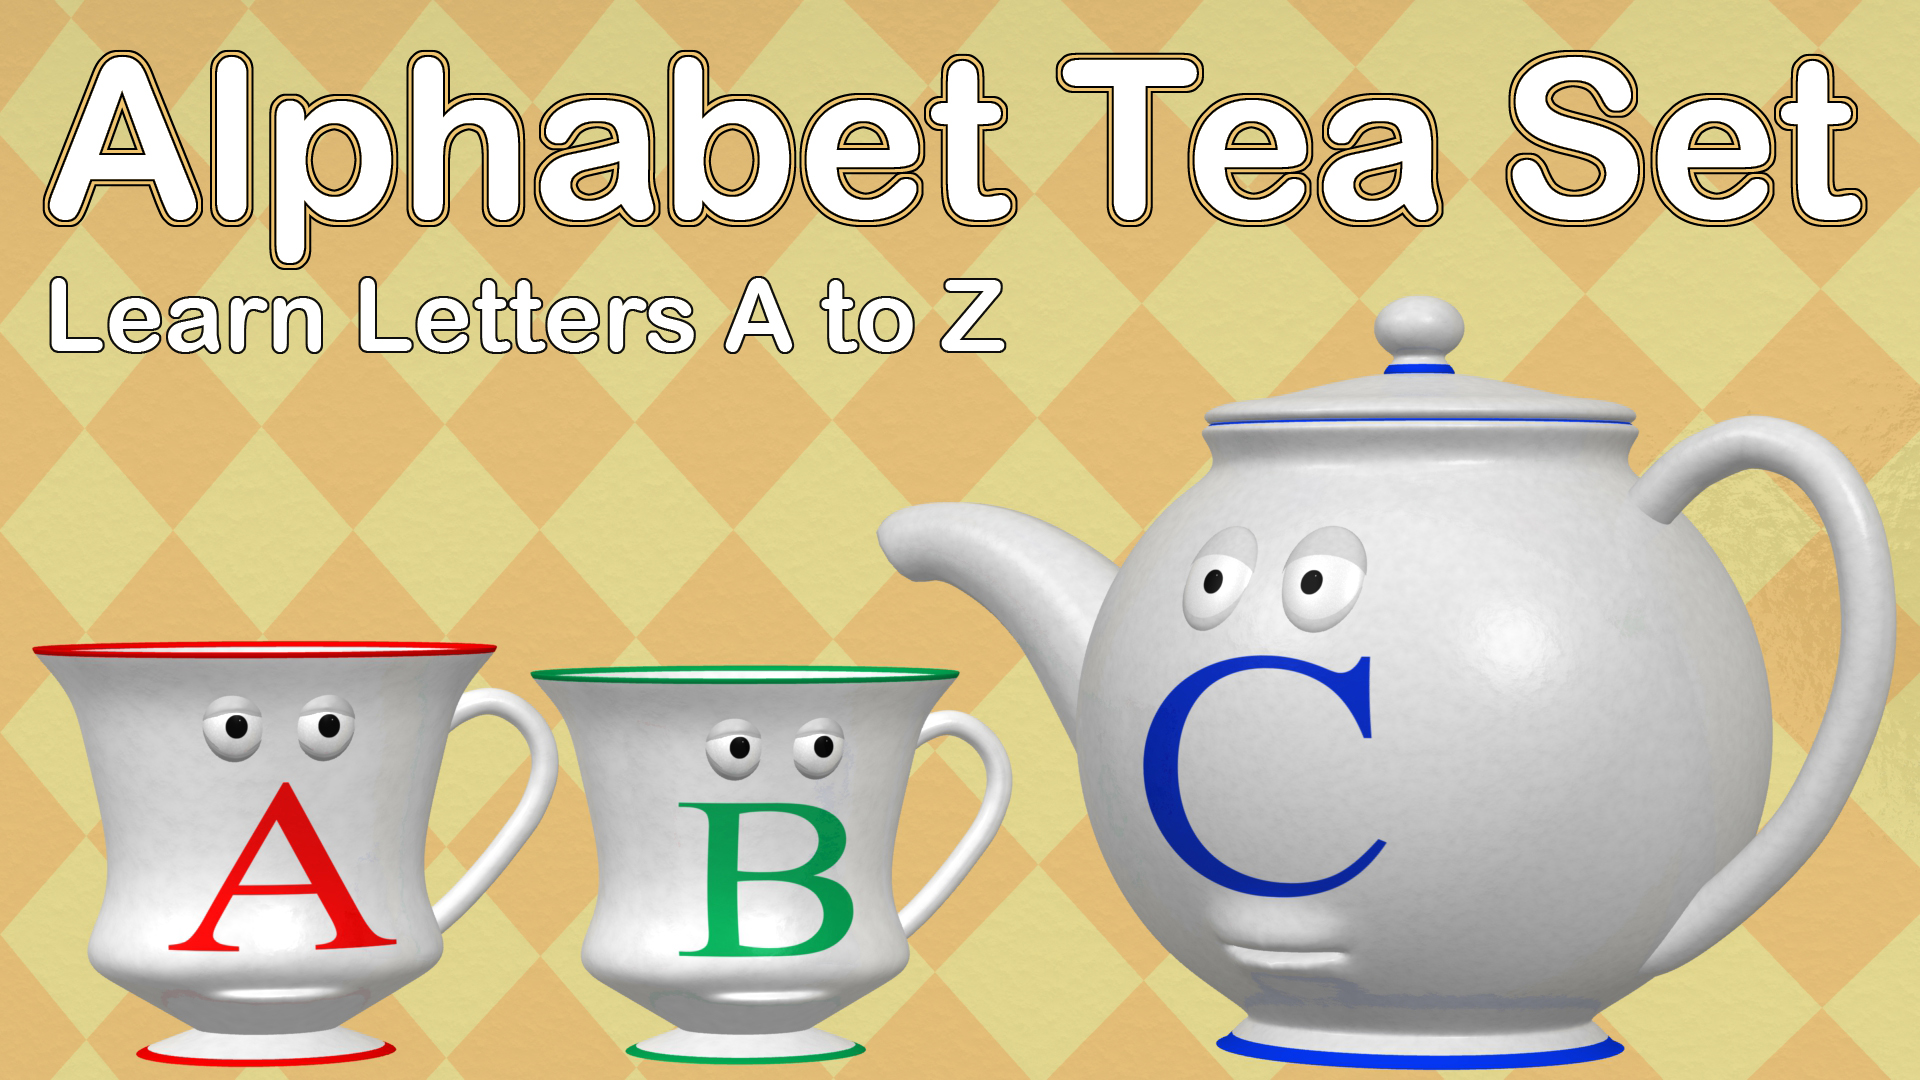 Alphabet Tea Set - Learn Letters A to Z